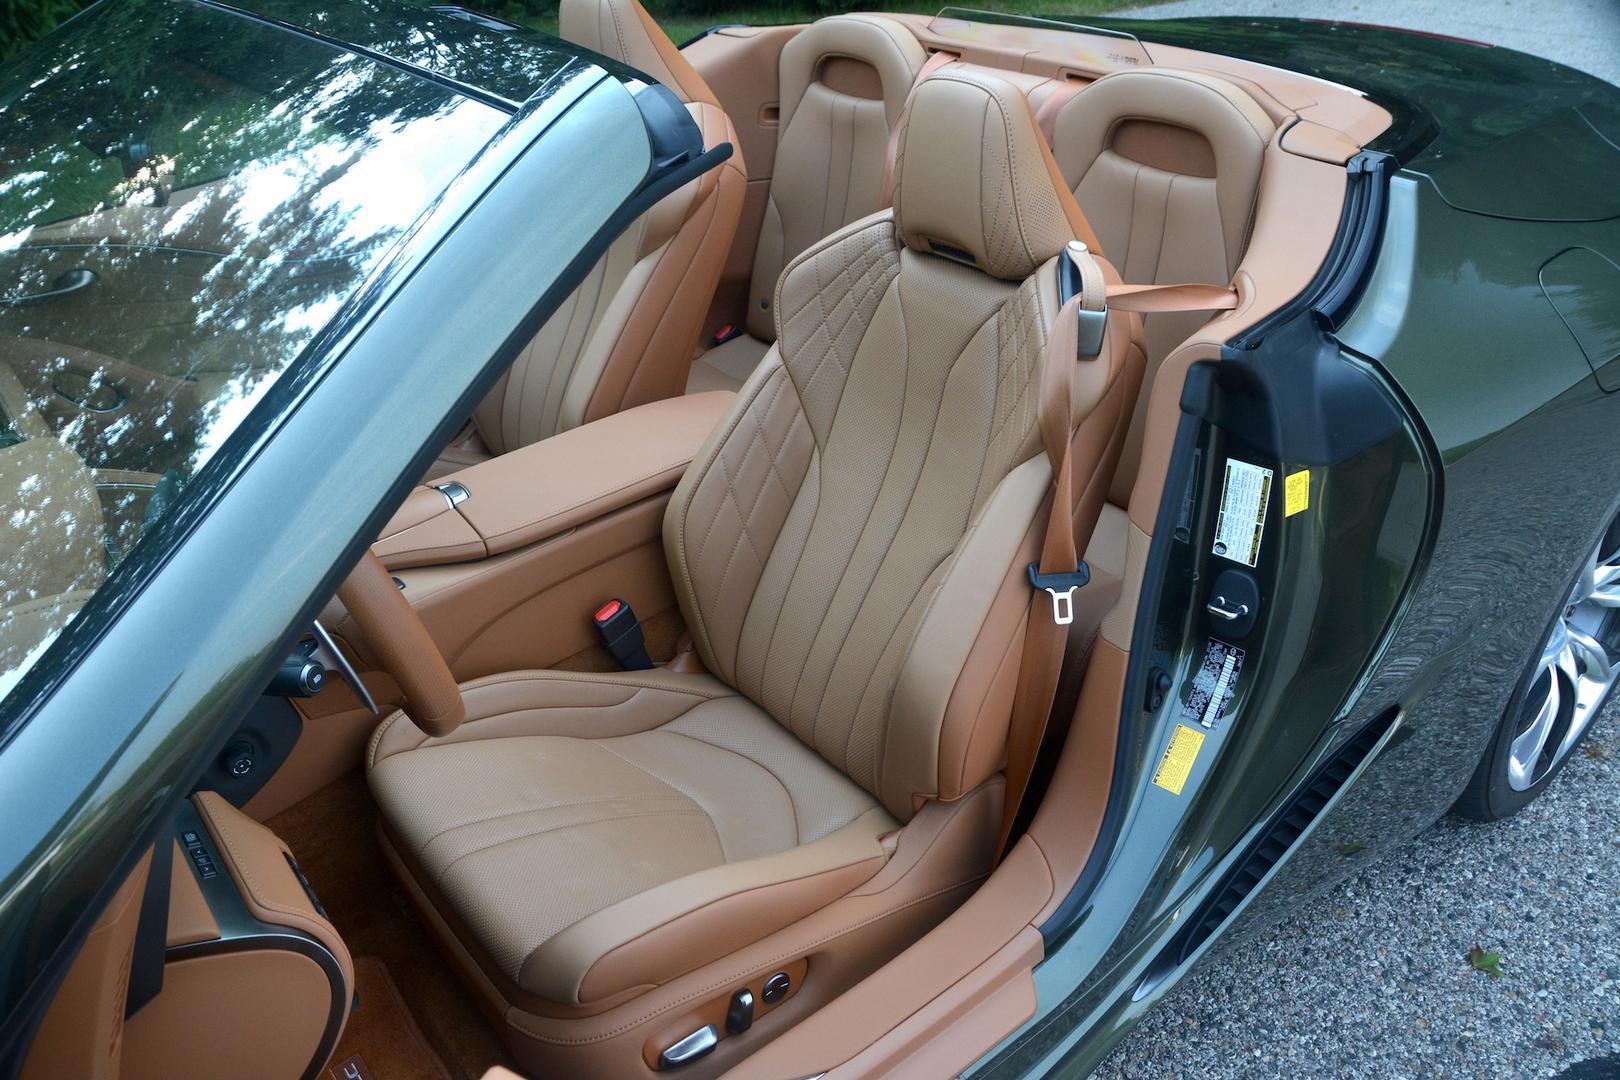 Lexus LC 500 Convertible seats